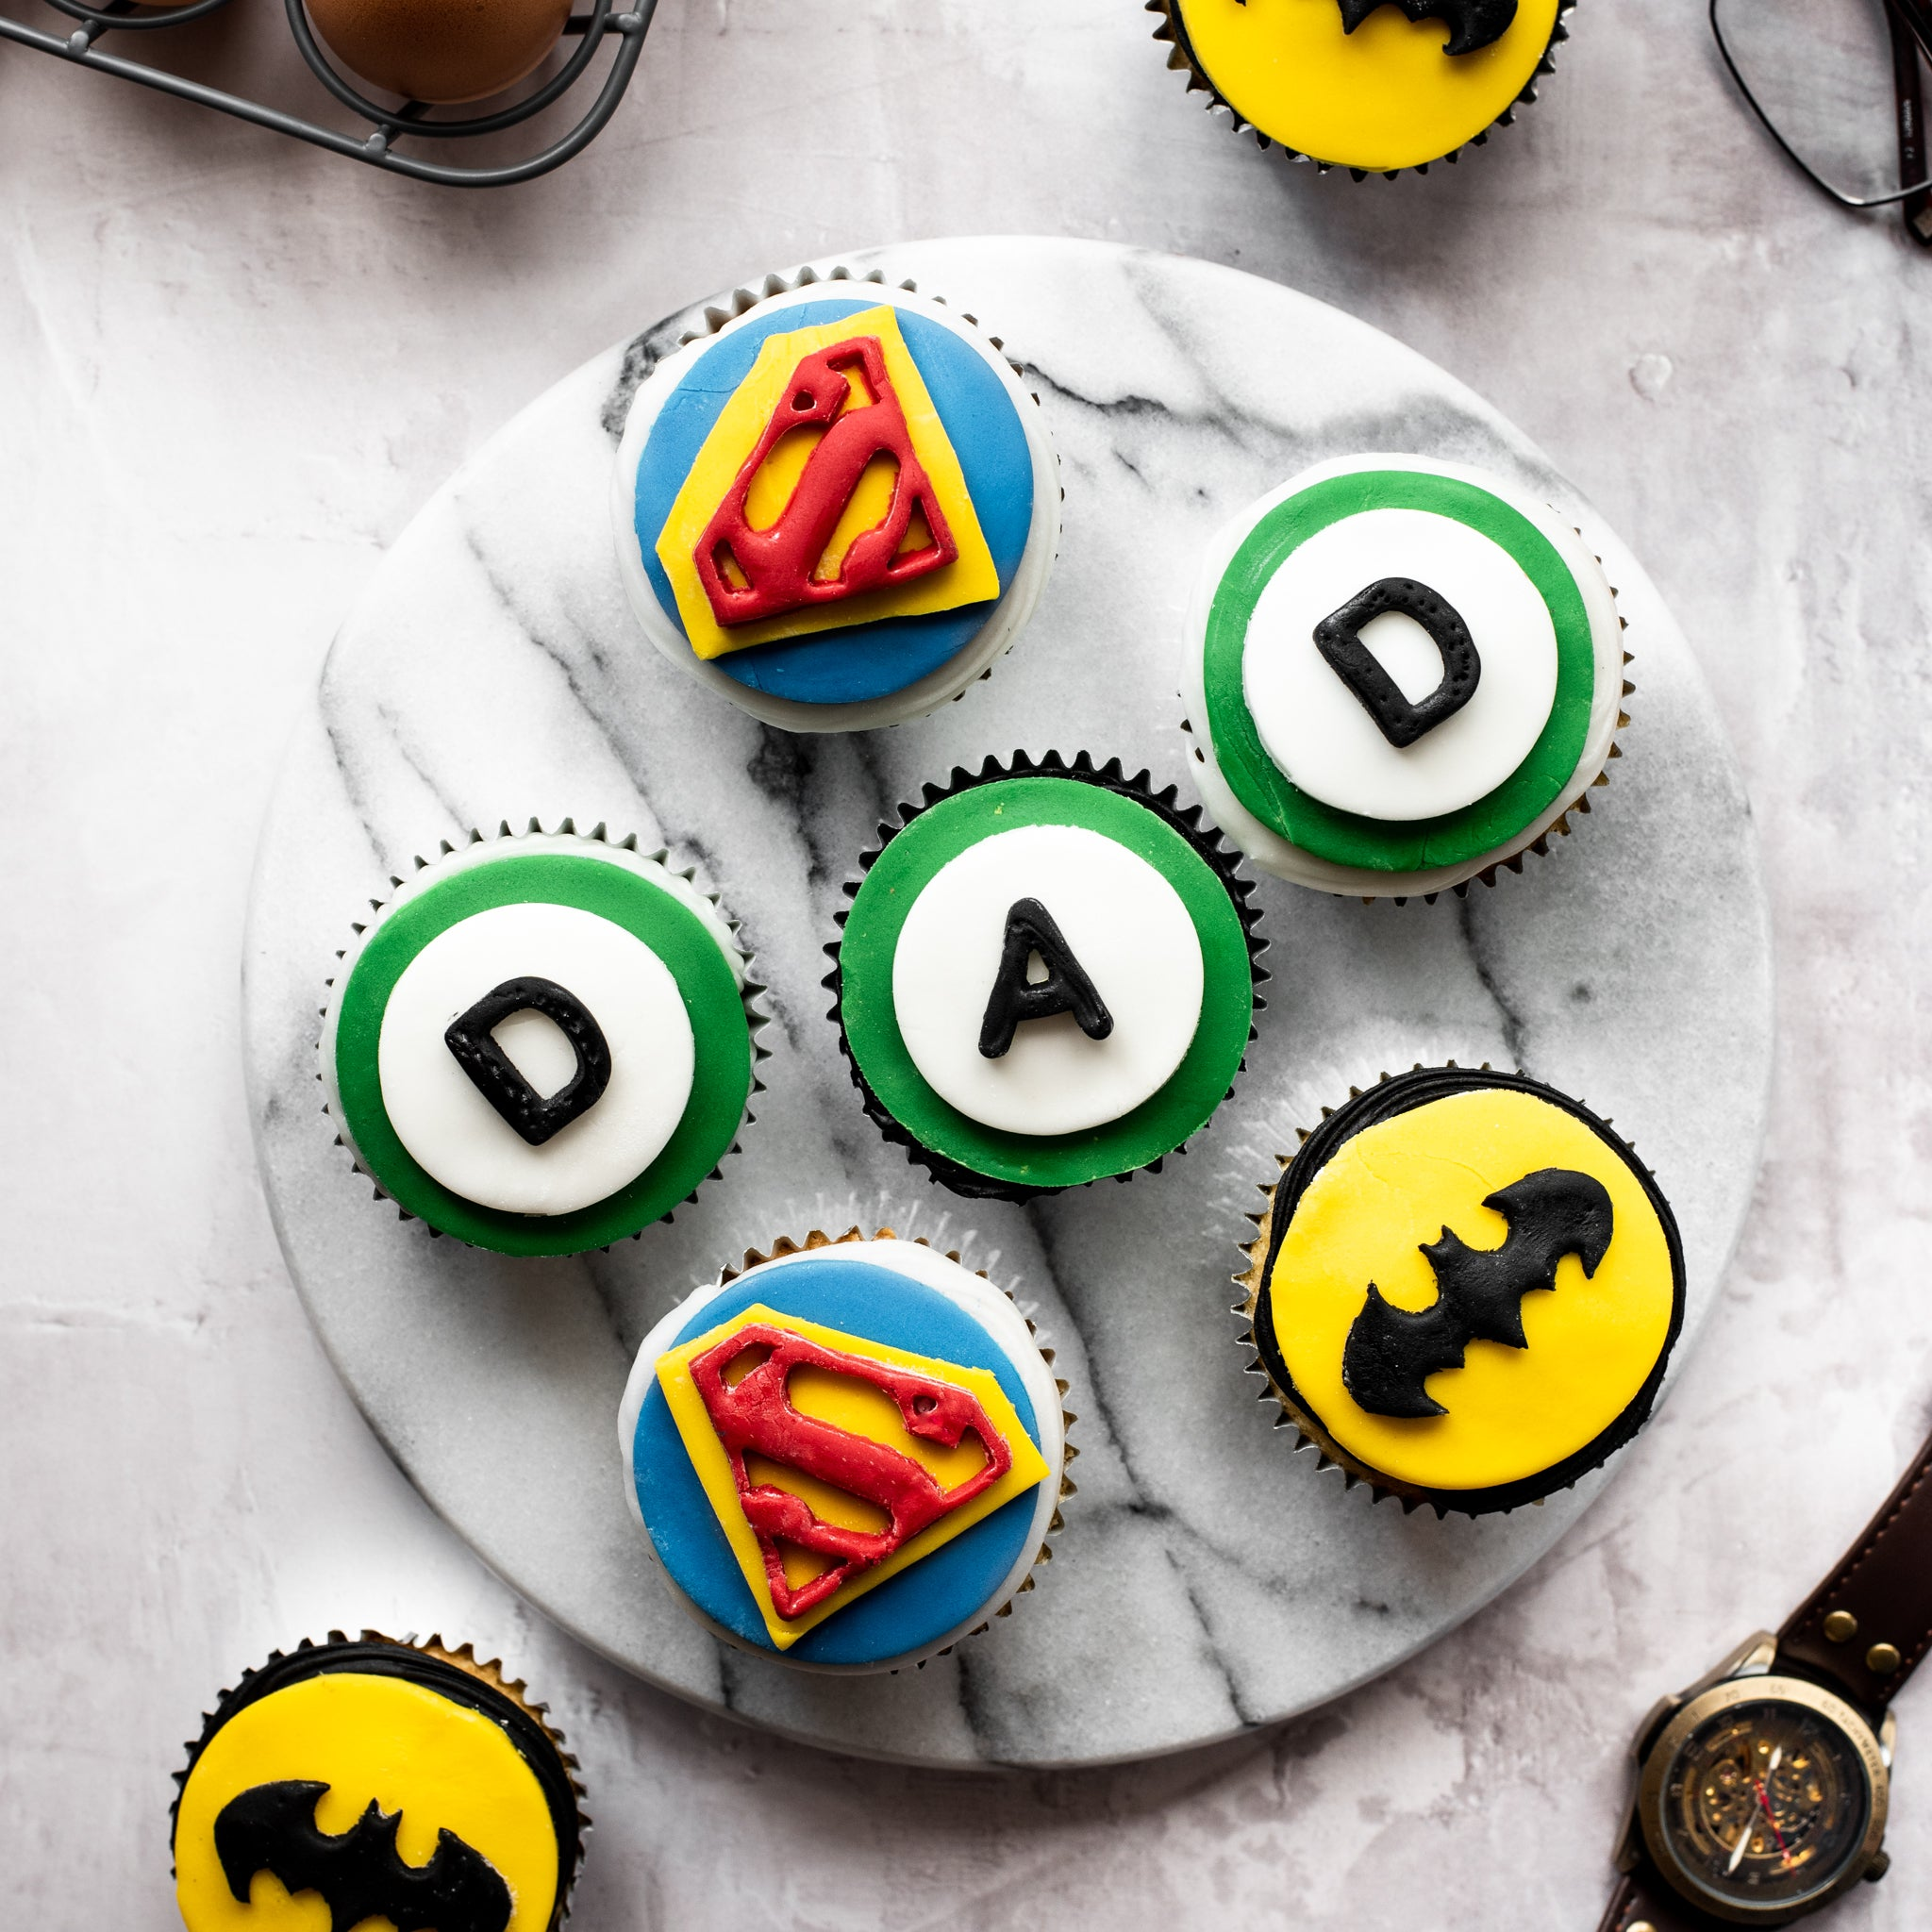 Fathers-Day-Superhero-Cupcakes-SQUARE-1.jpg